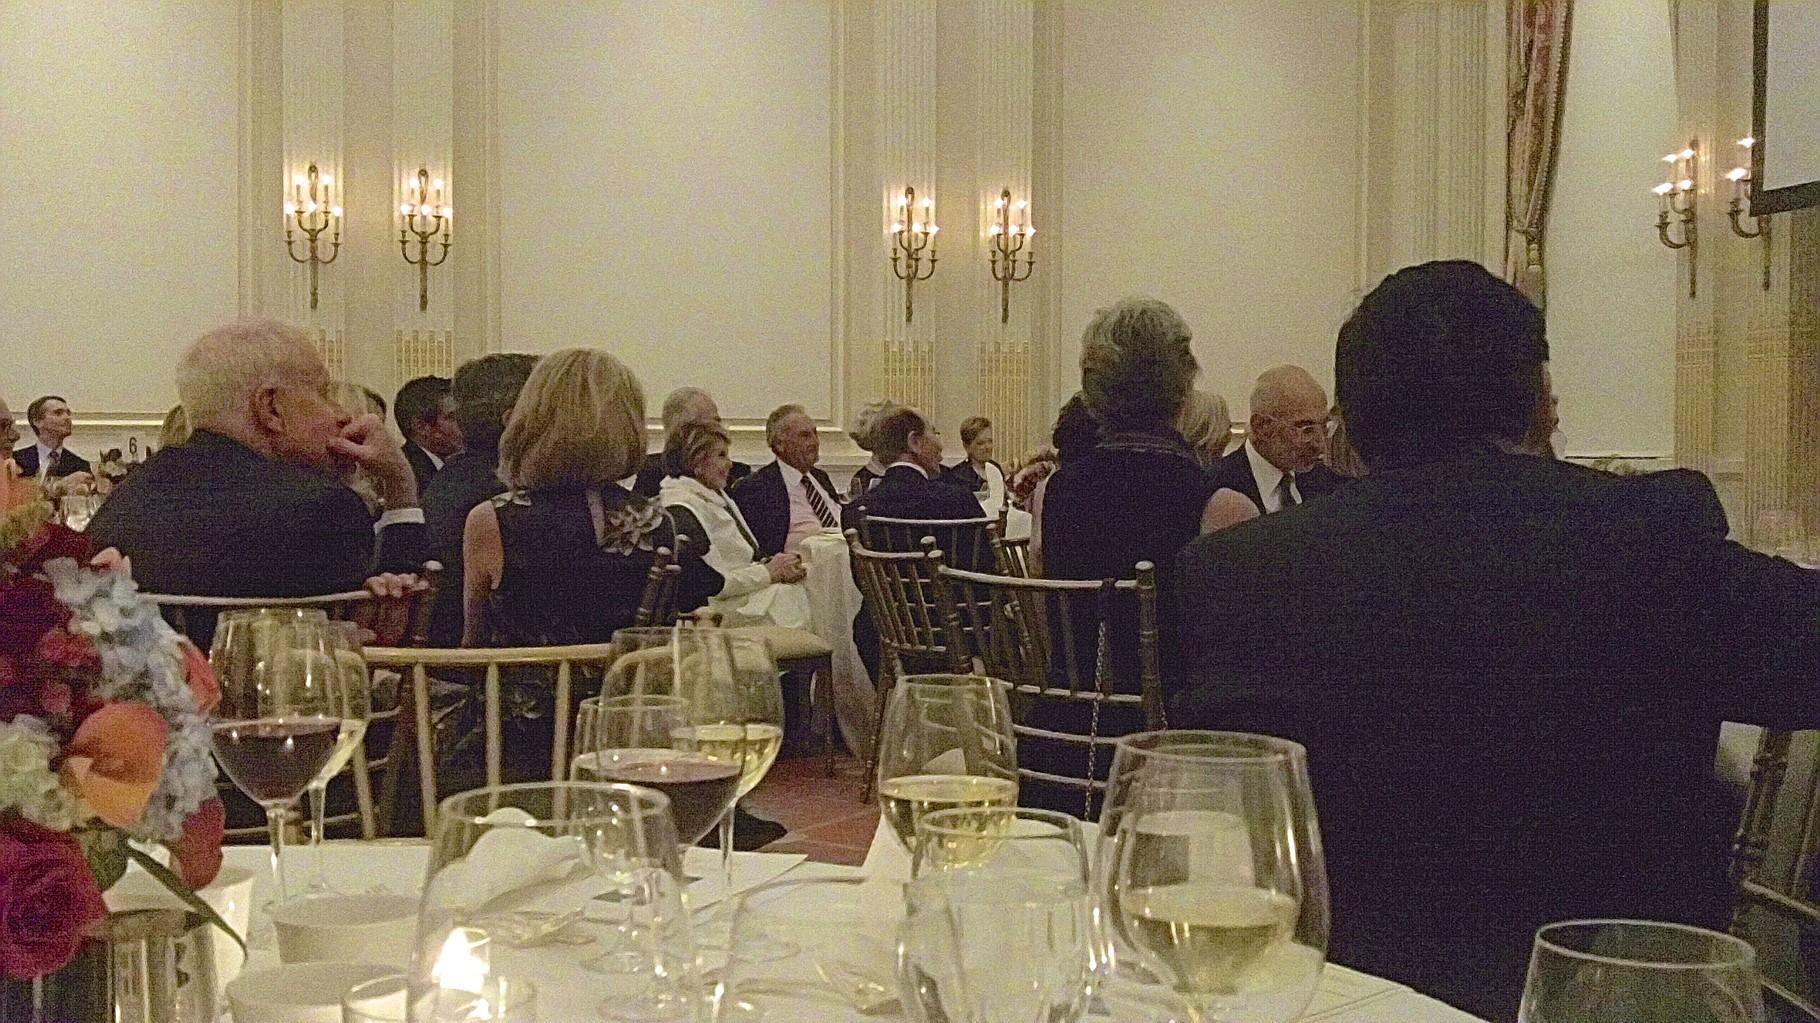 Joan & Sandy Weill, Hank Greenberg enjoy the jokes at the party.